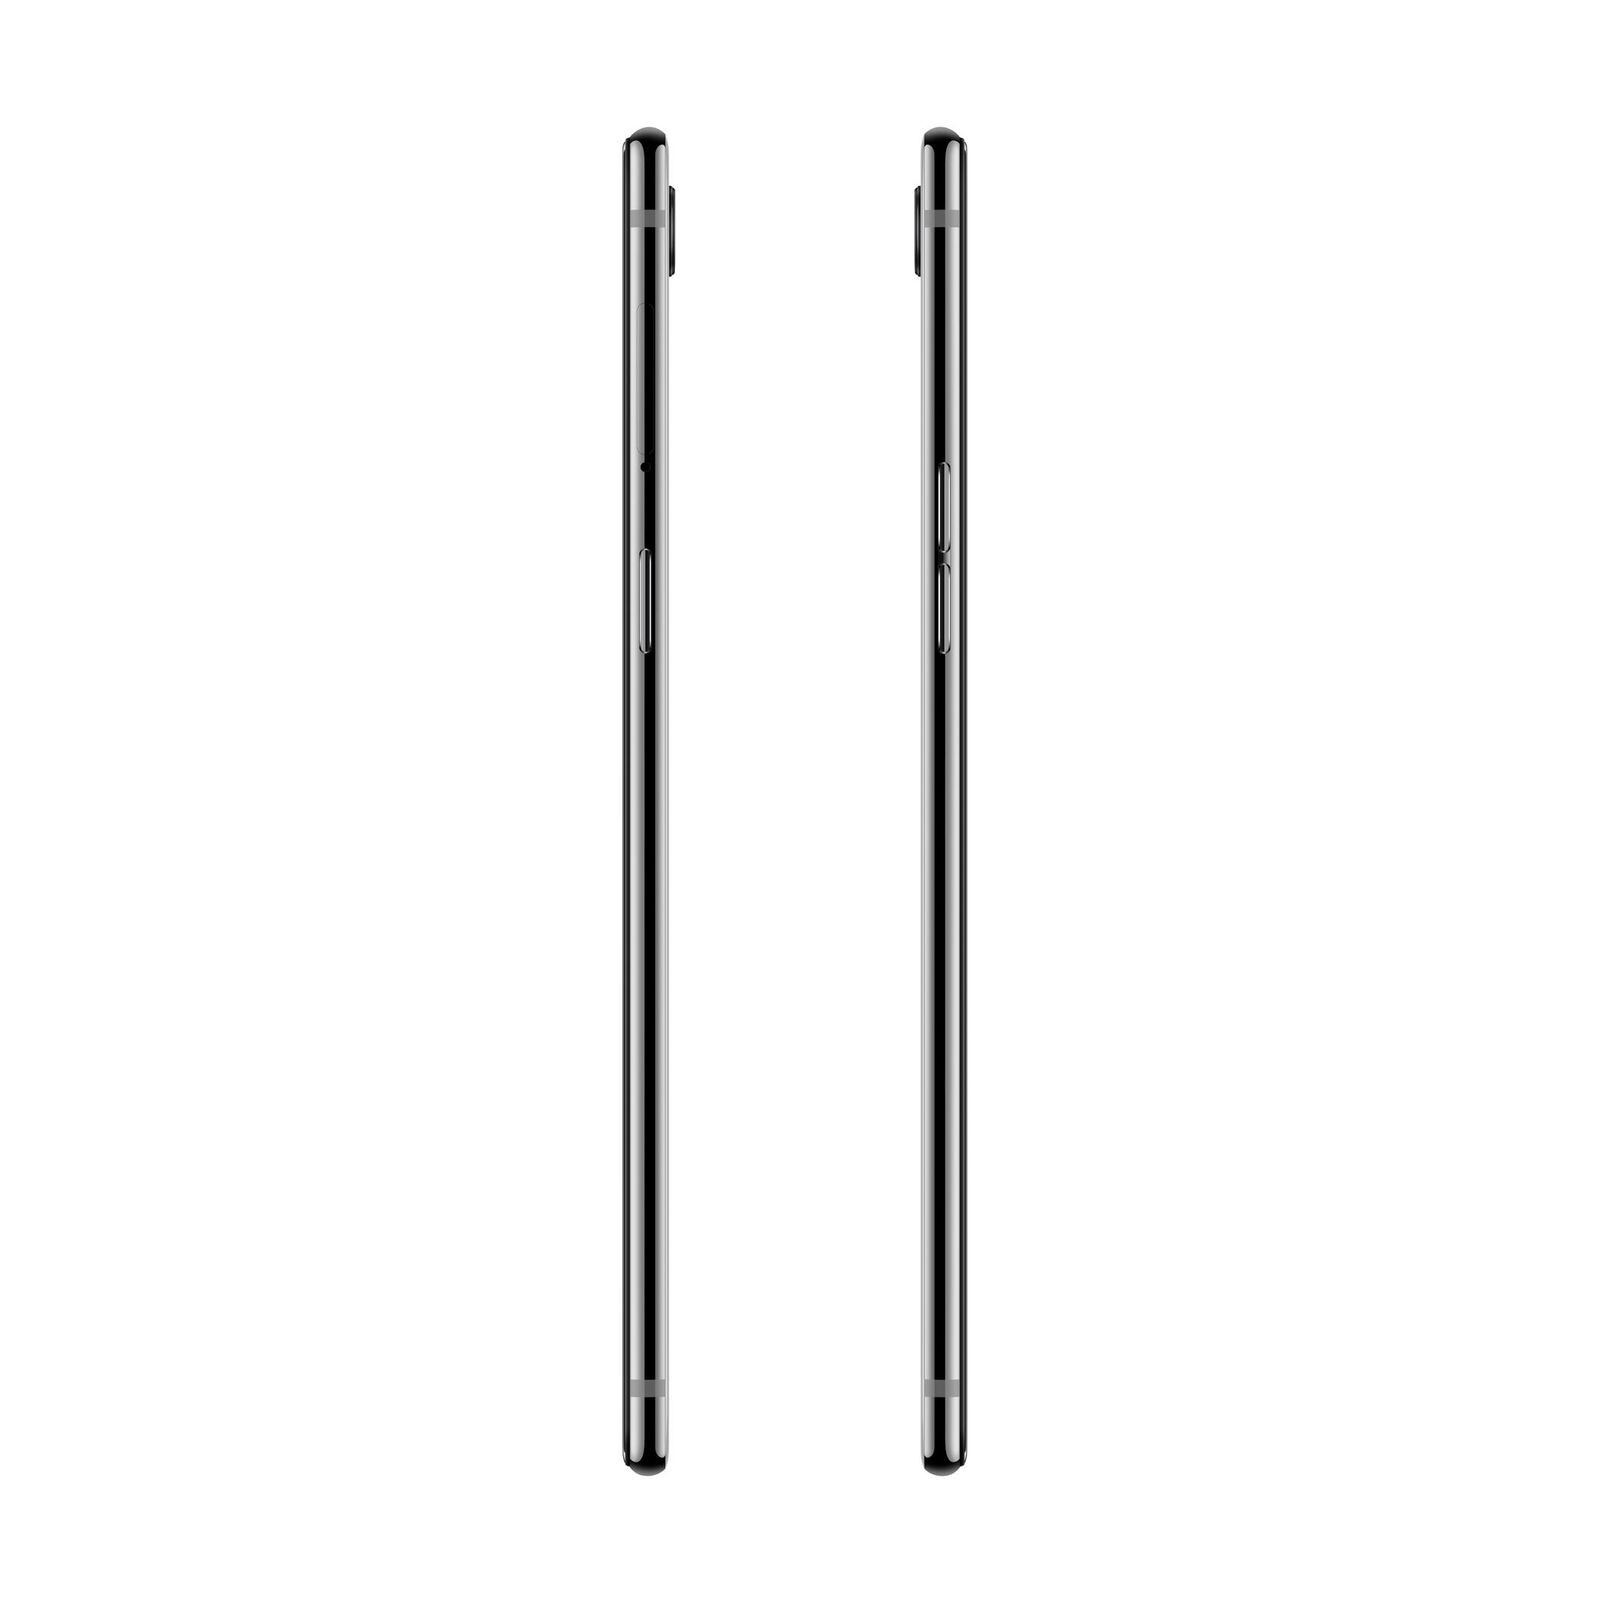 Buy The Oppo R15 Dual Sim Smartphone 128gb Frost White 2 Years Nokia 603 2gb Warranty